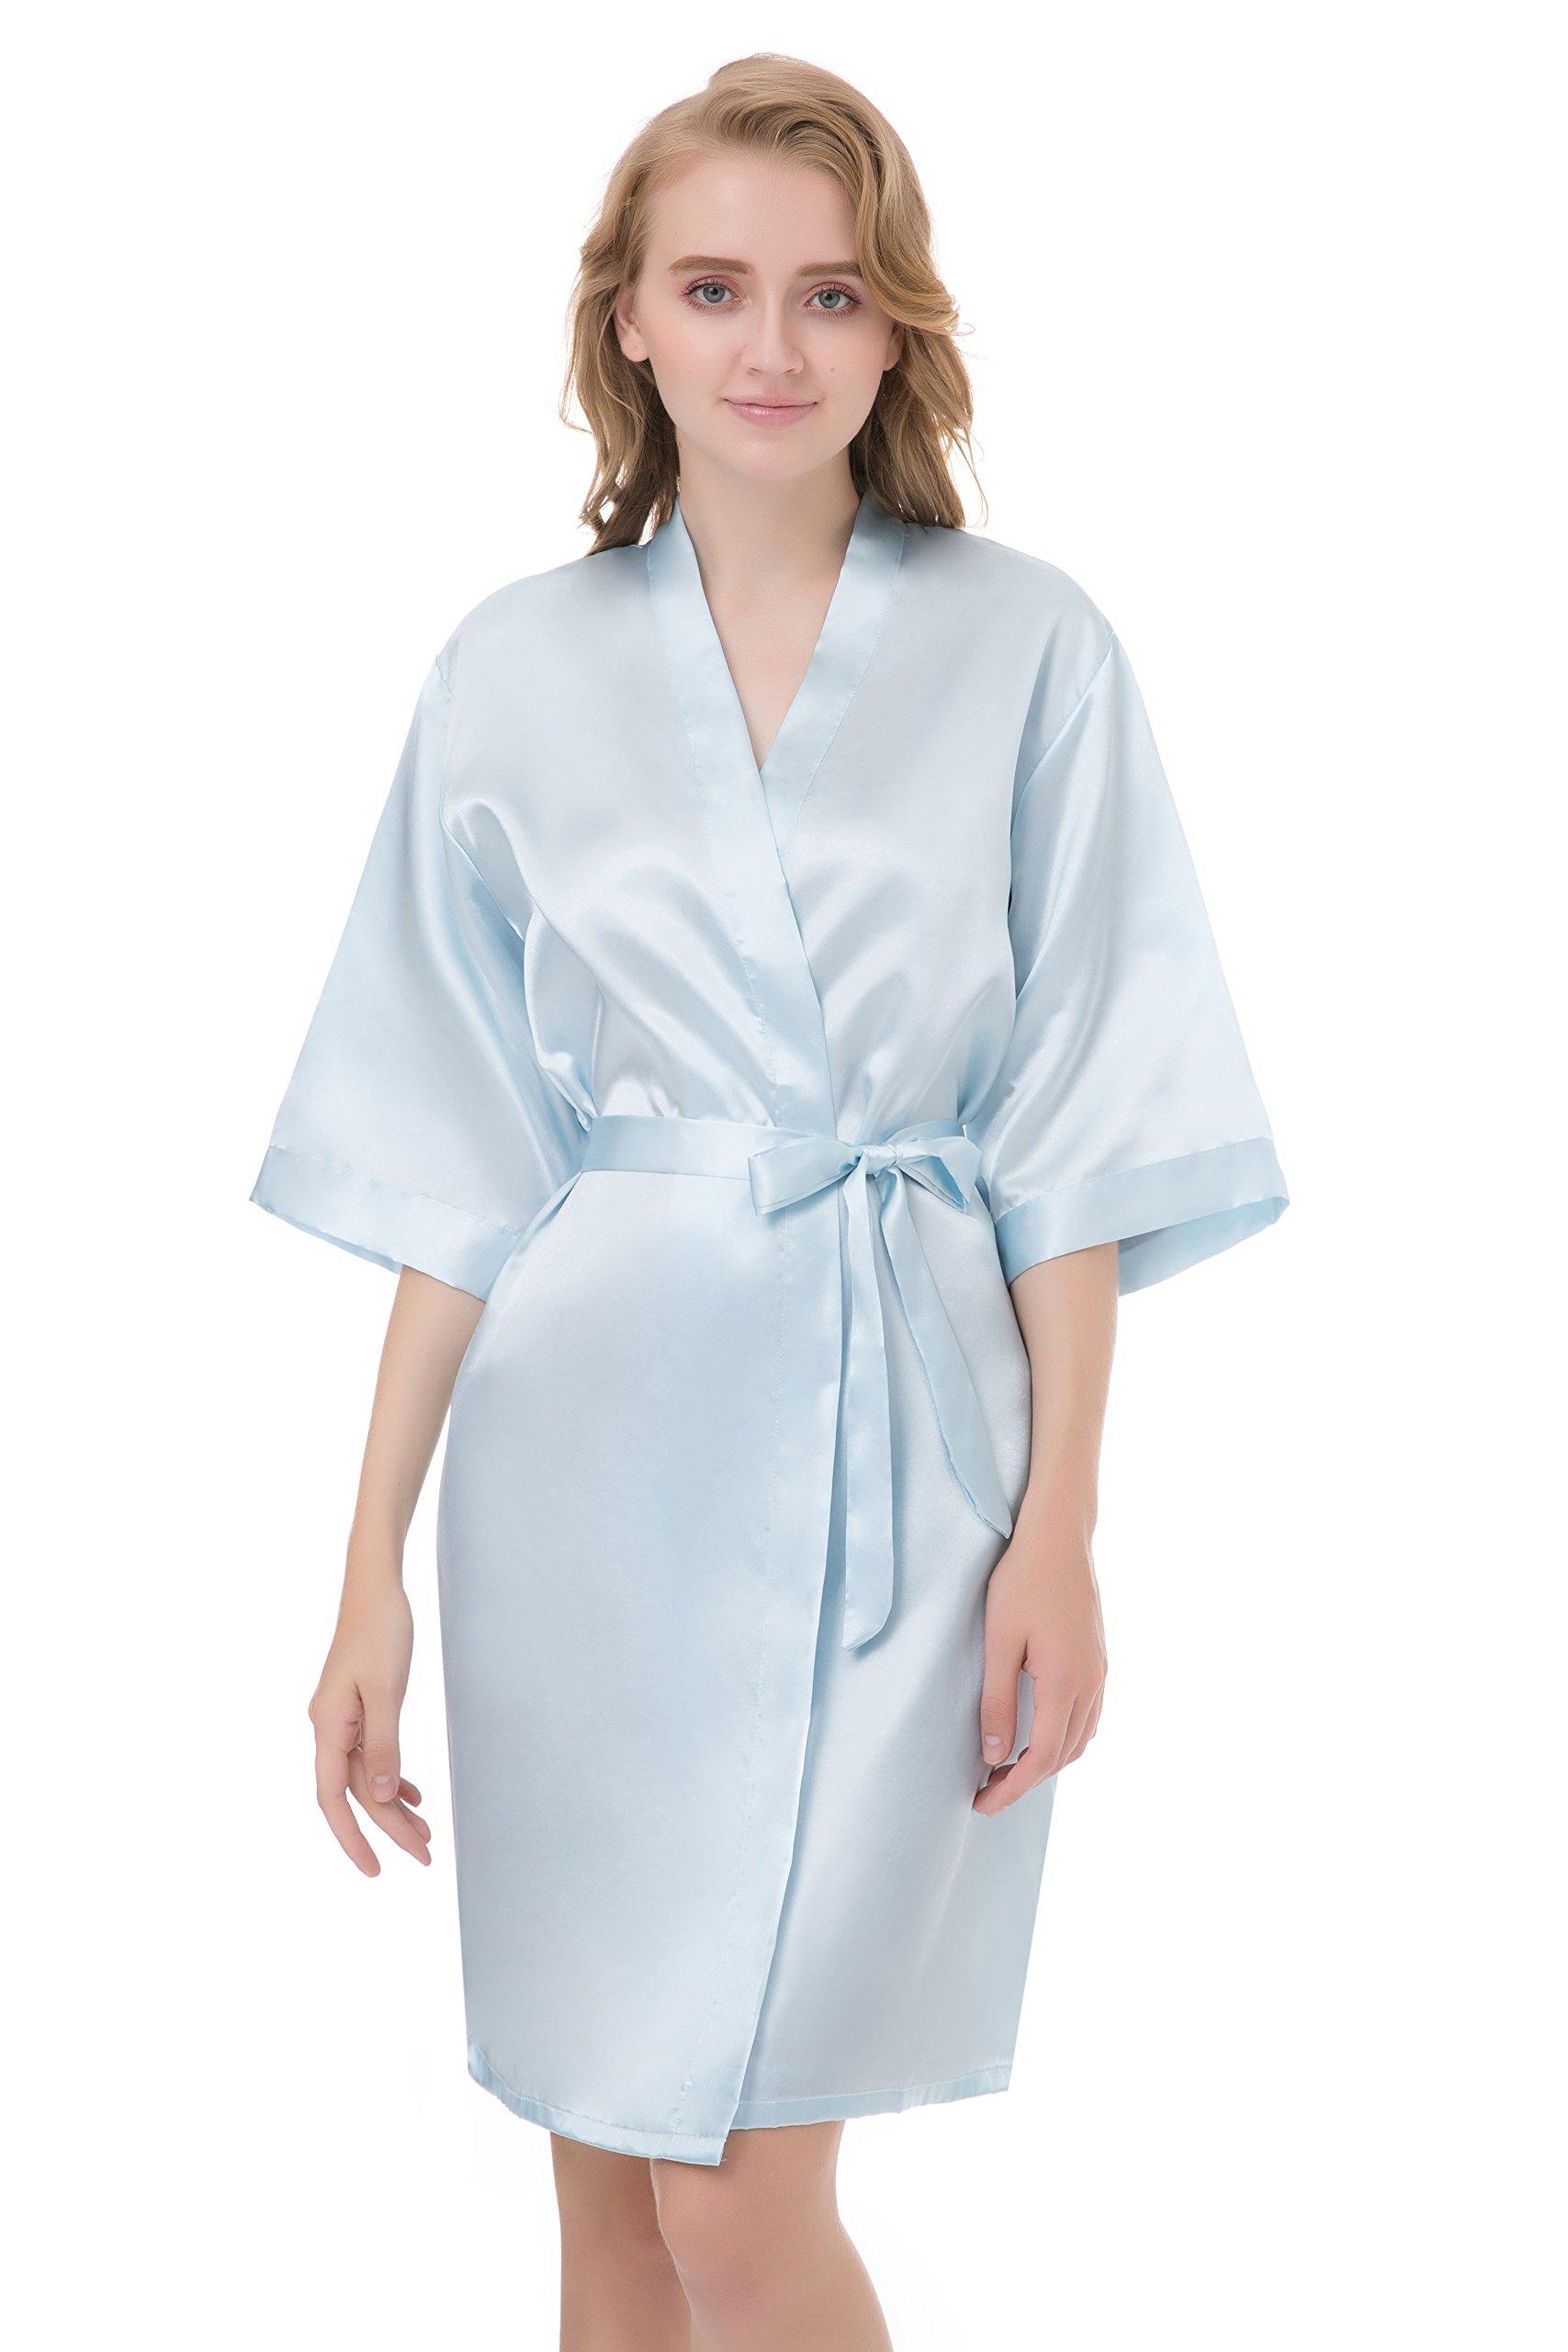 the54c1 sioro womens satin robe silky kimono bathrobe for bride ...